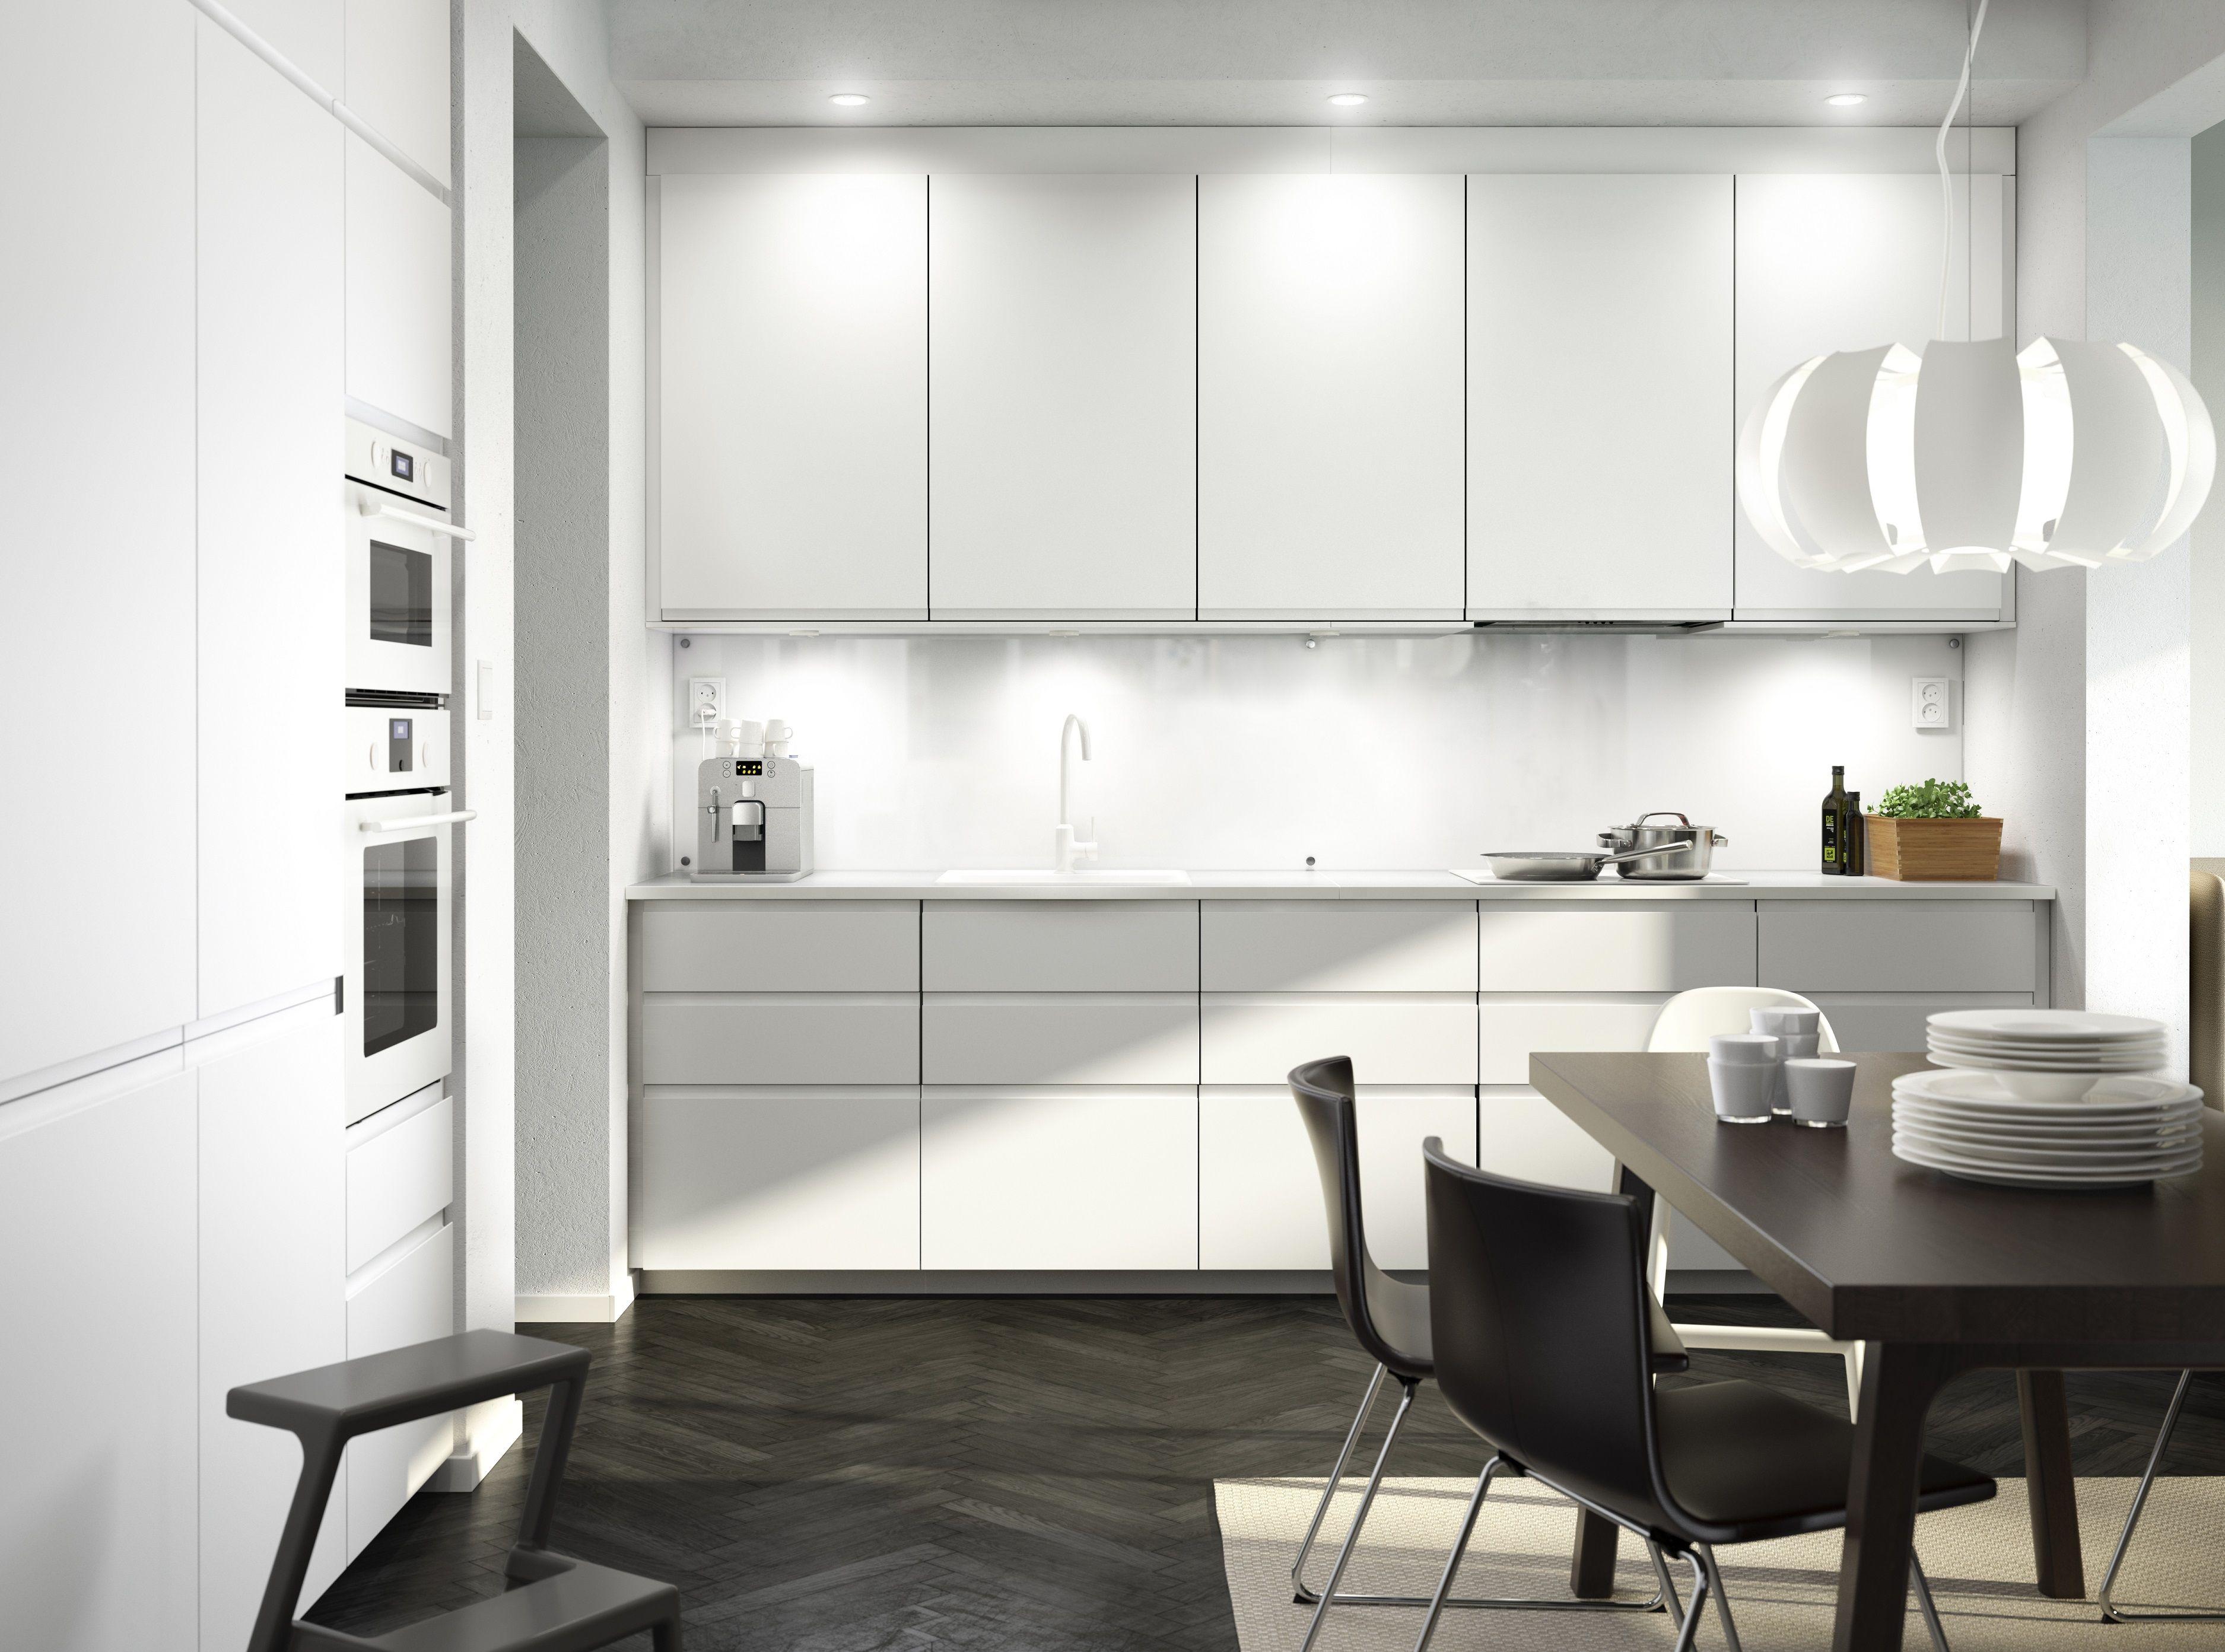 Metod Keuken Ikea : Ikea keukens greeploos speciaal galerij van keuken ikea